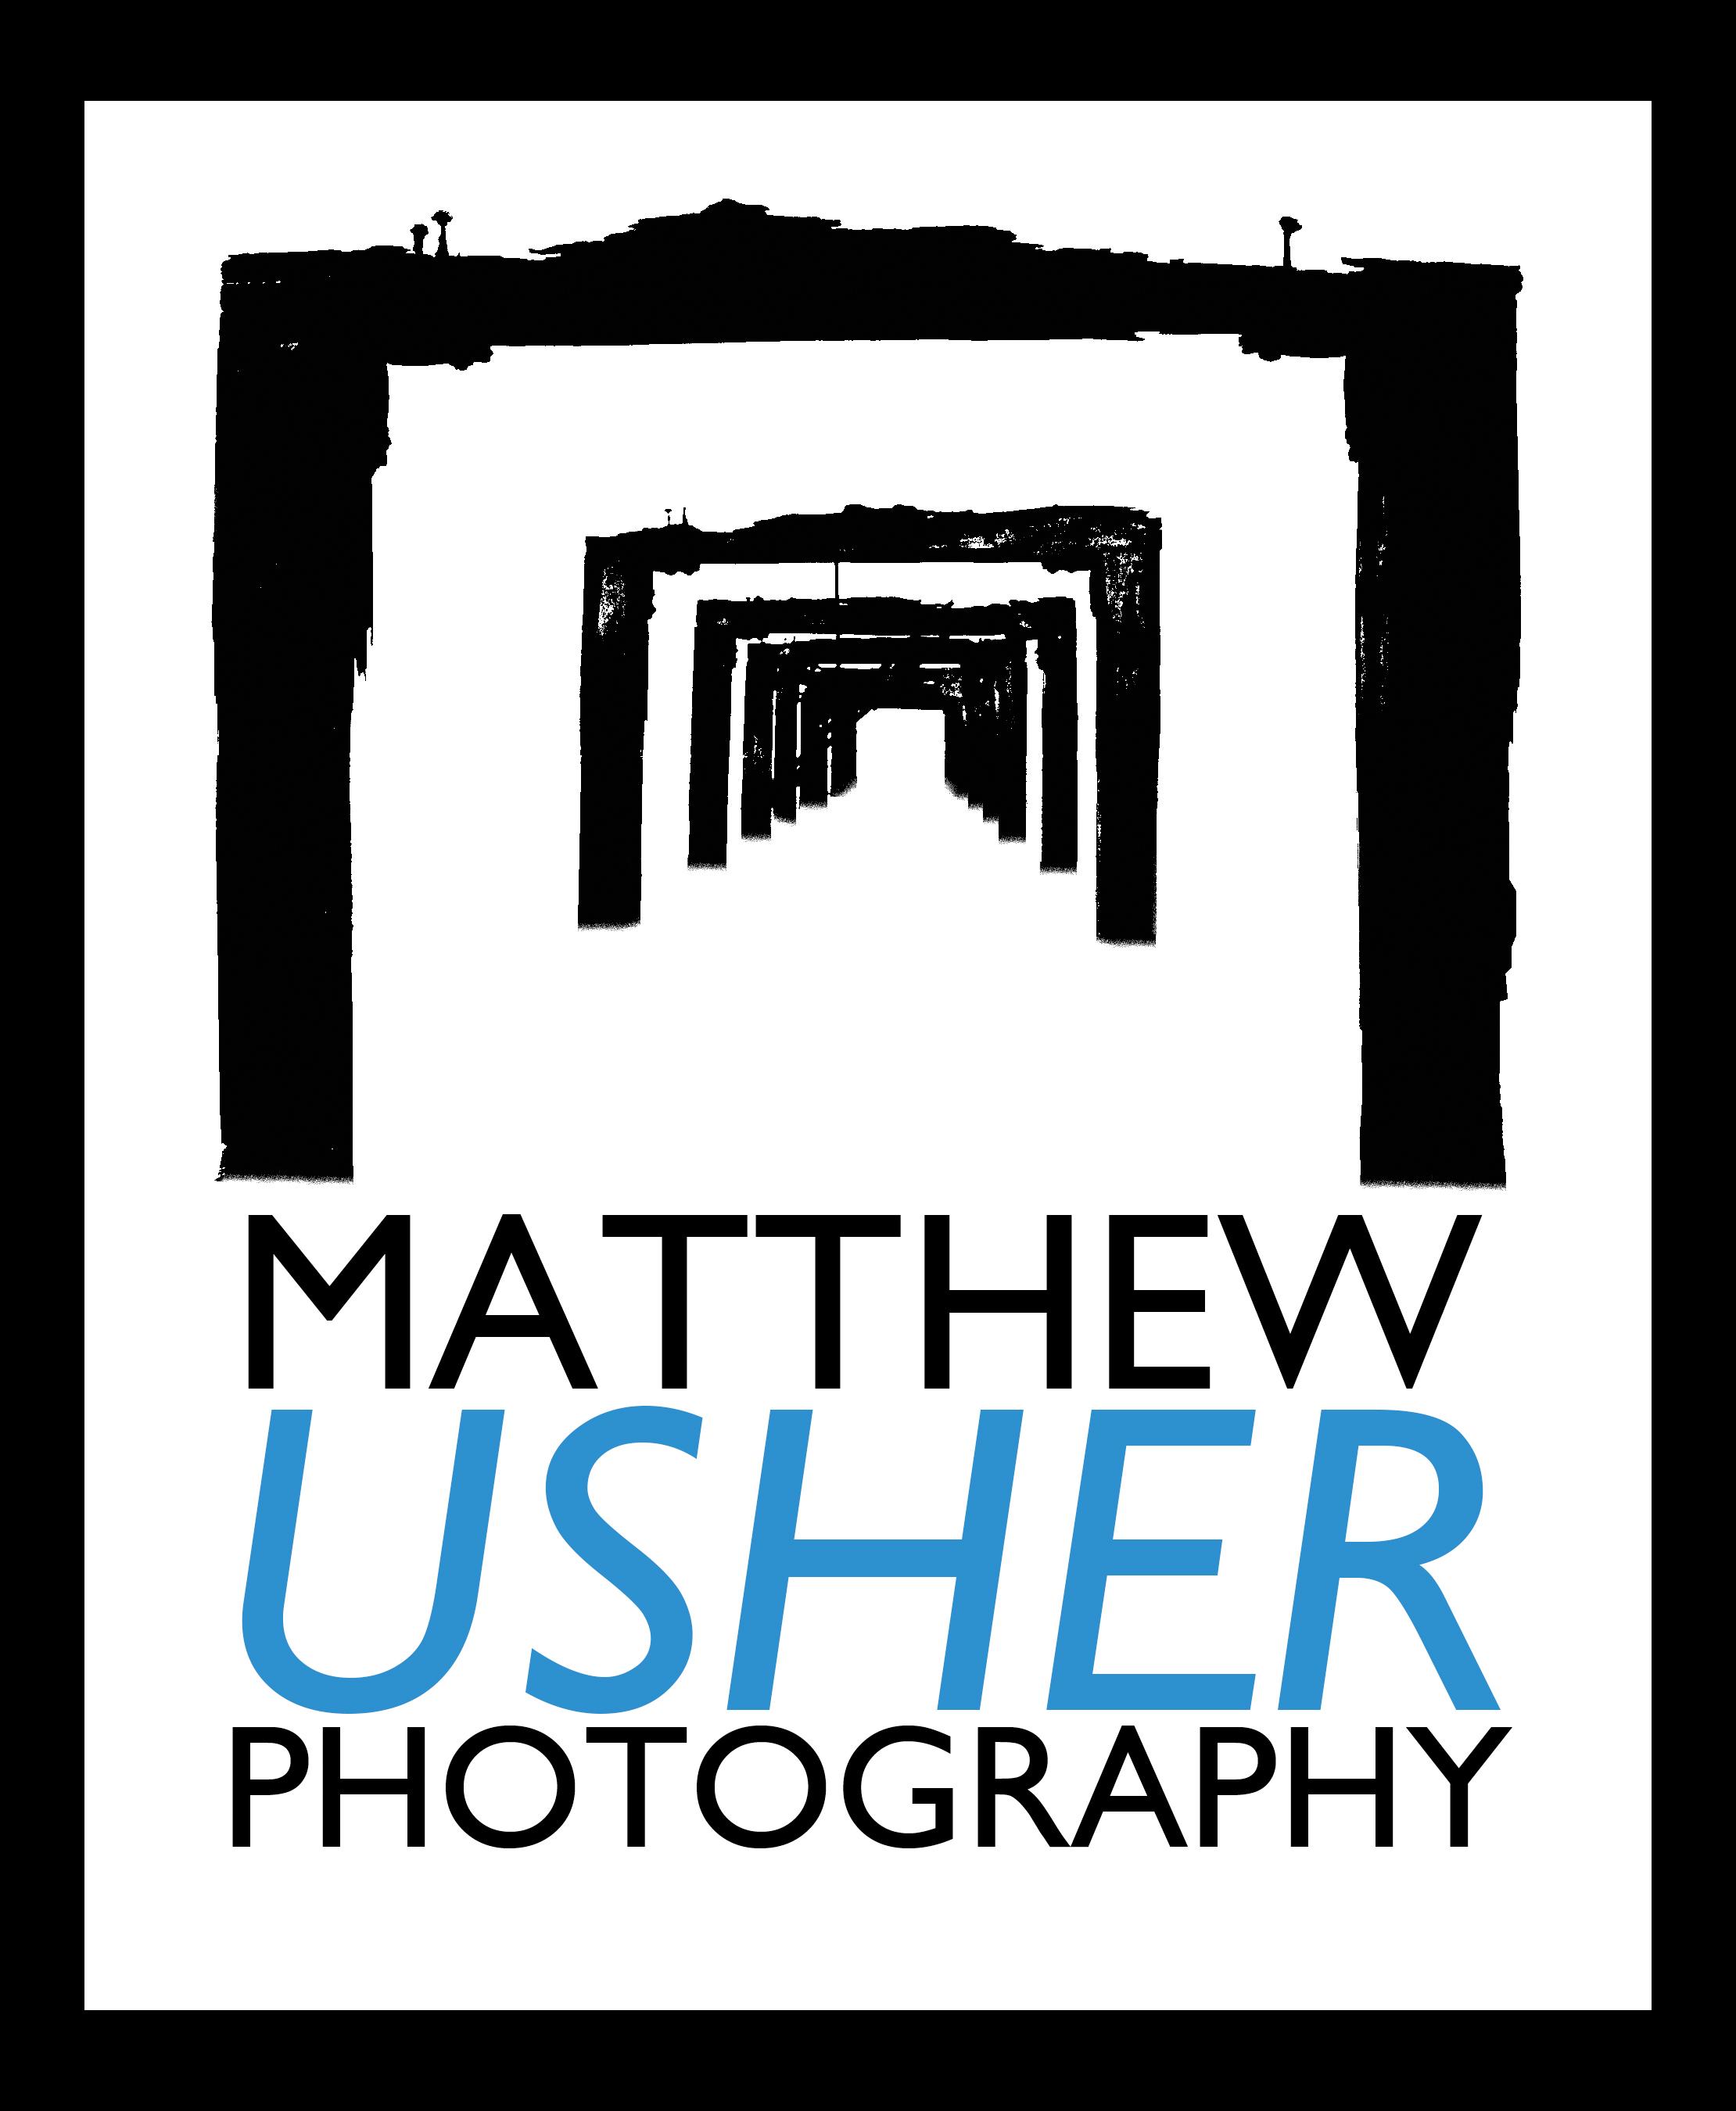 Matthew Usher Photography - King's Lynn, Norwich and Norfolk photographer